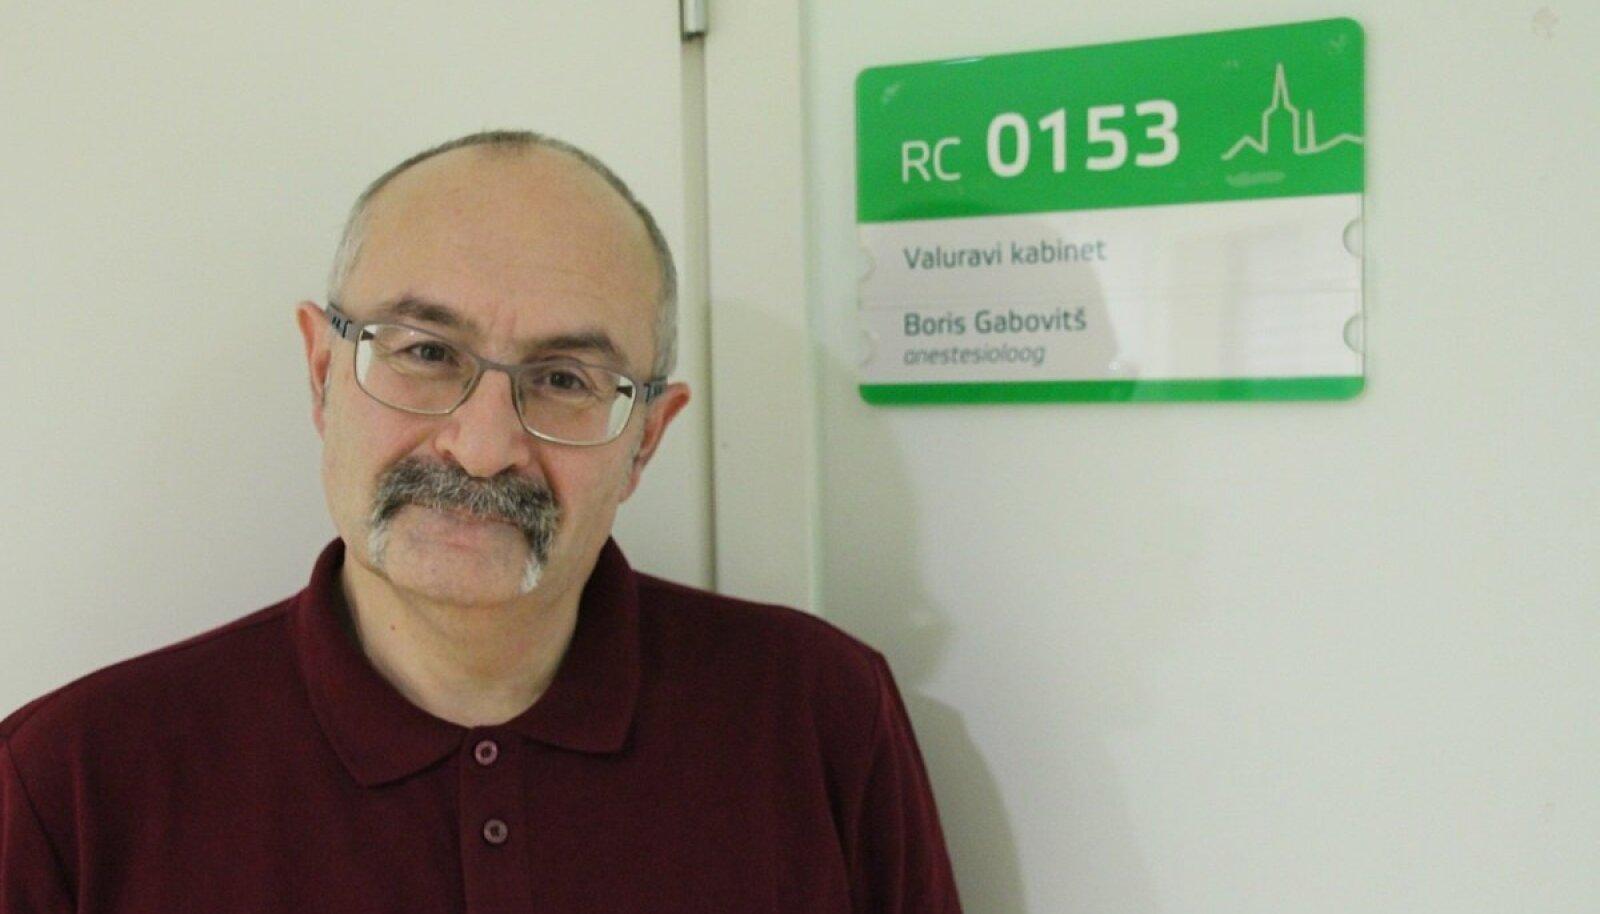 Dr Gabovitš